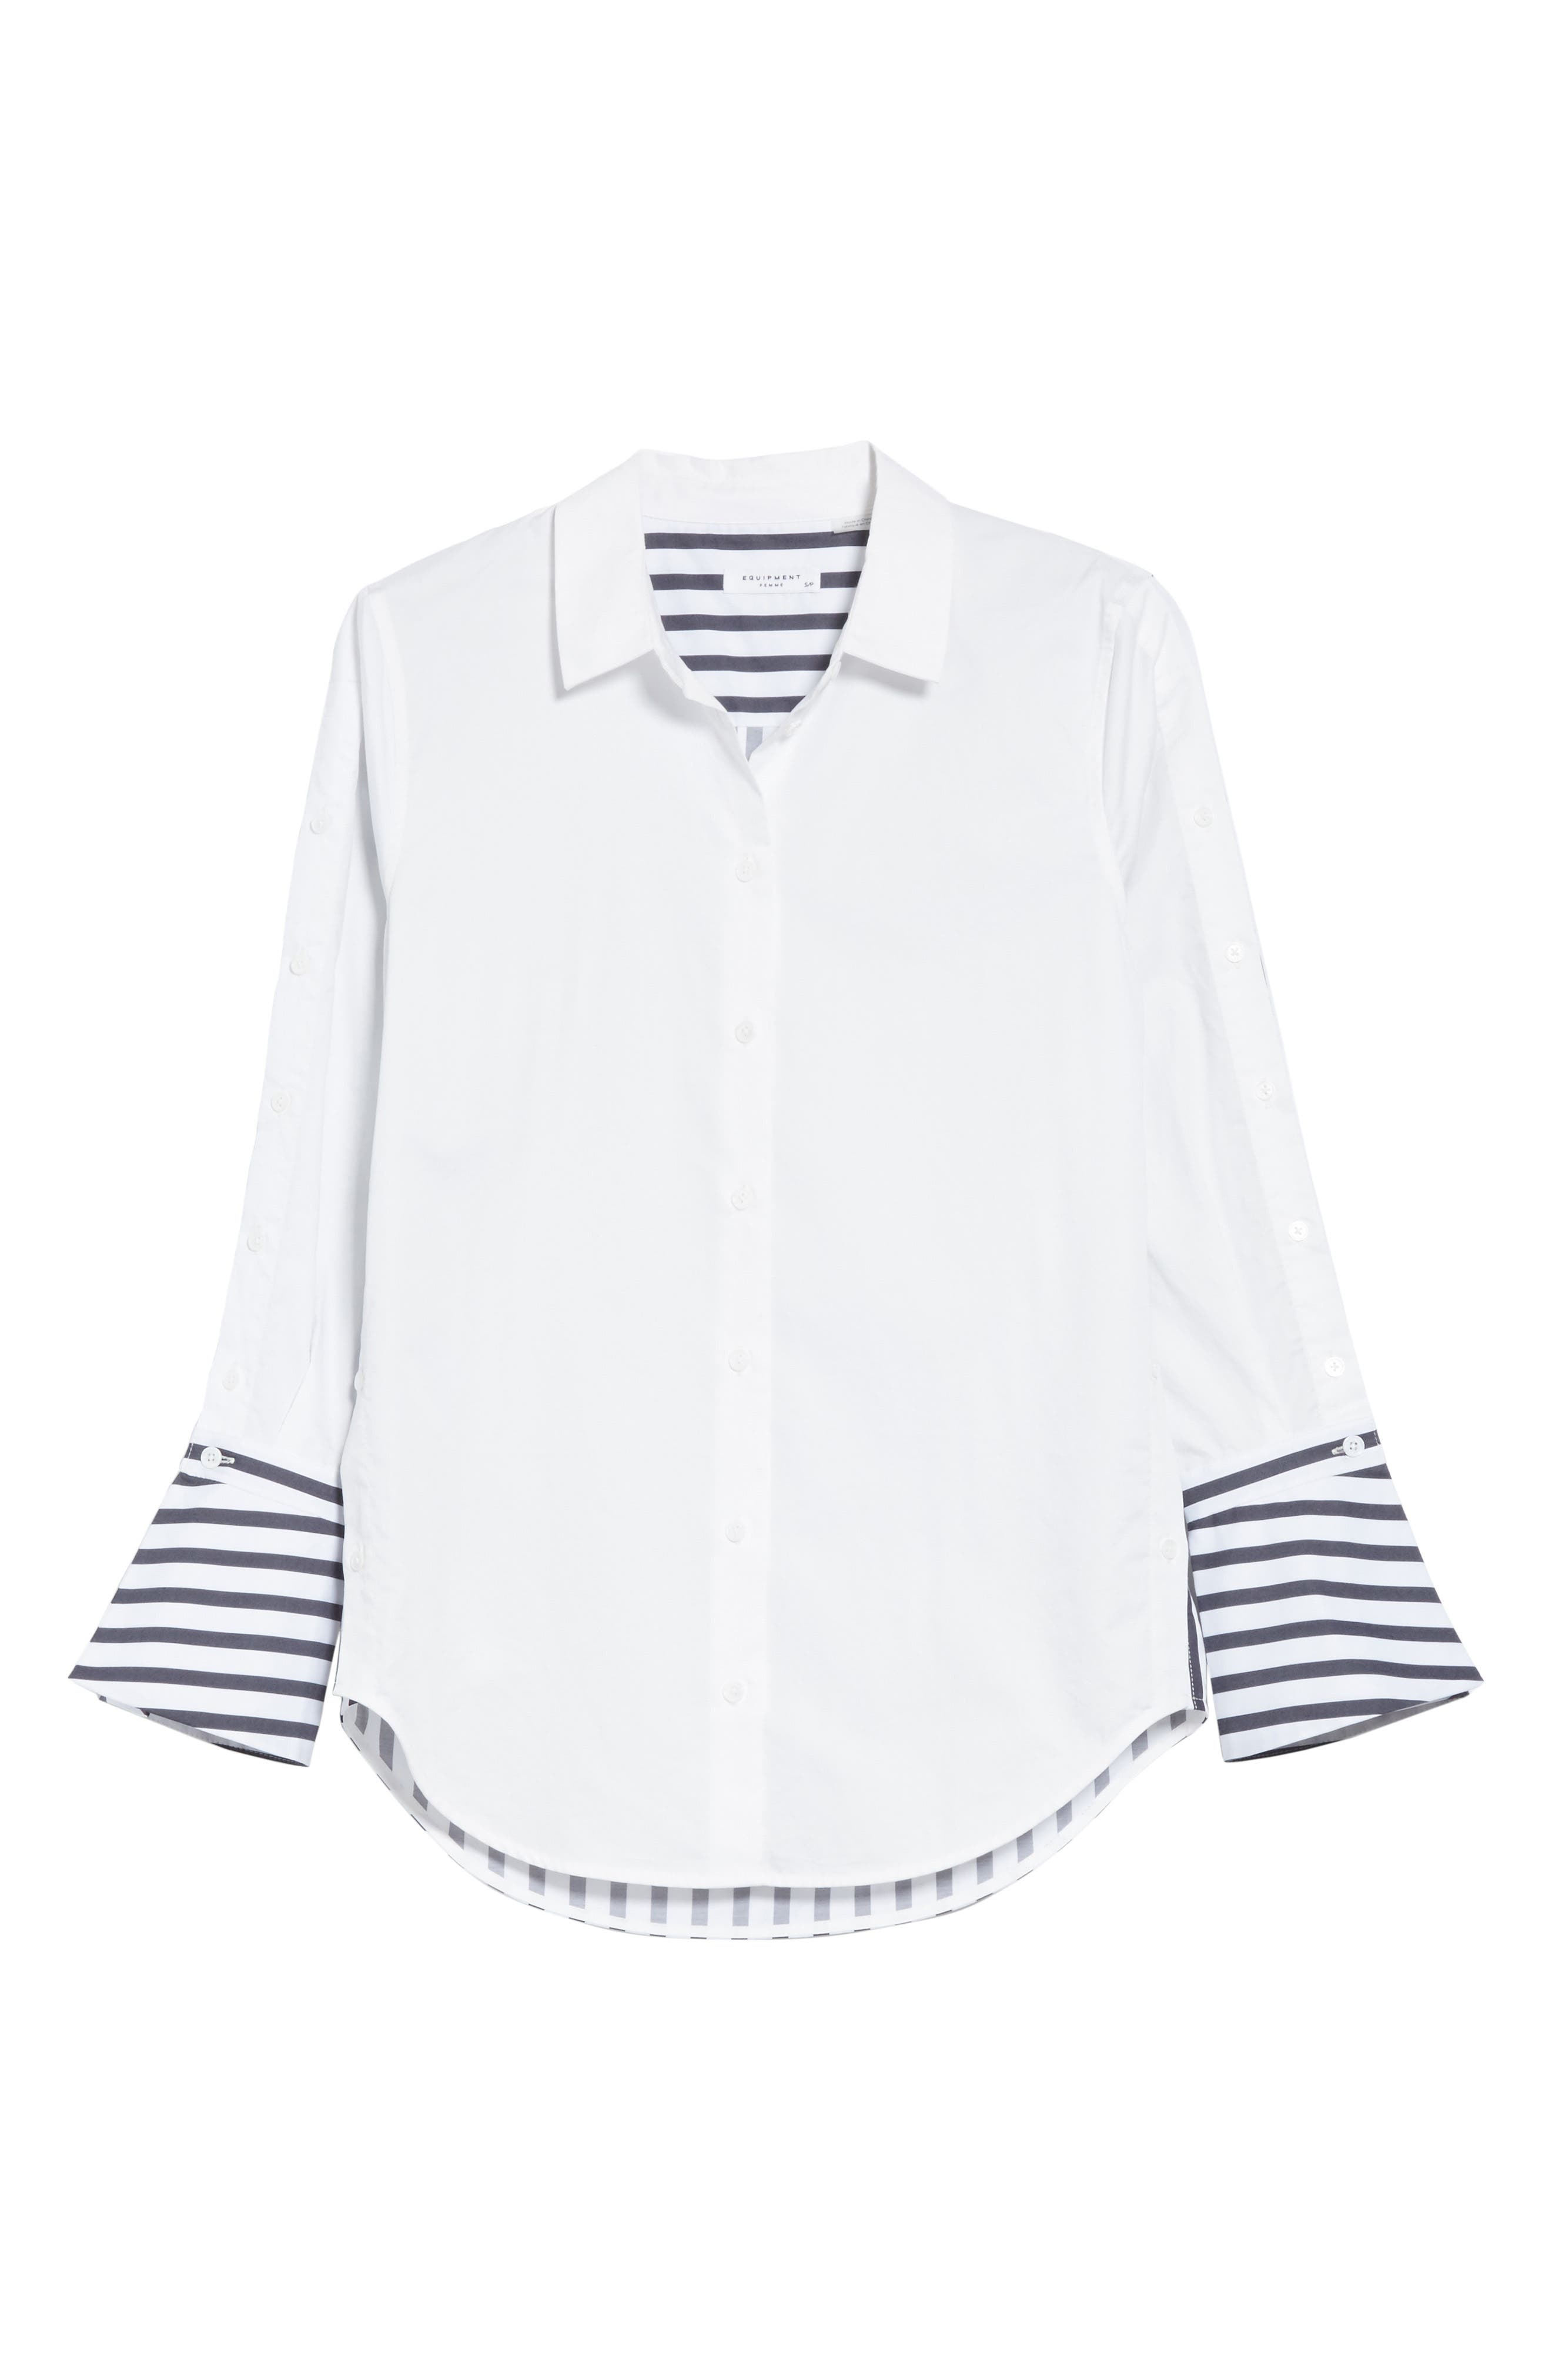 Rossi Contrast Stripe Button Down Shirt,                             Alternate thumbnail 6, color,                             Bright White/ Eclipse